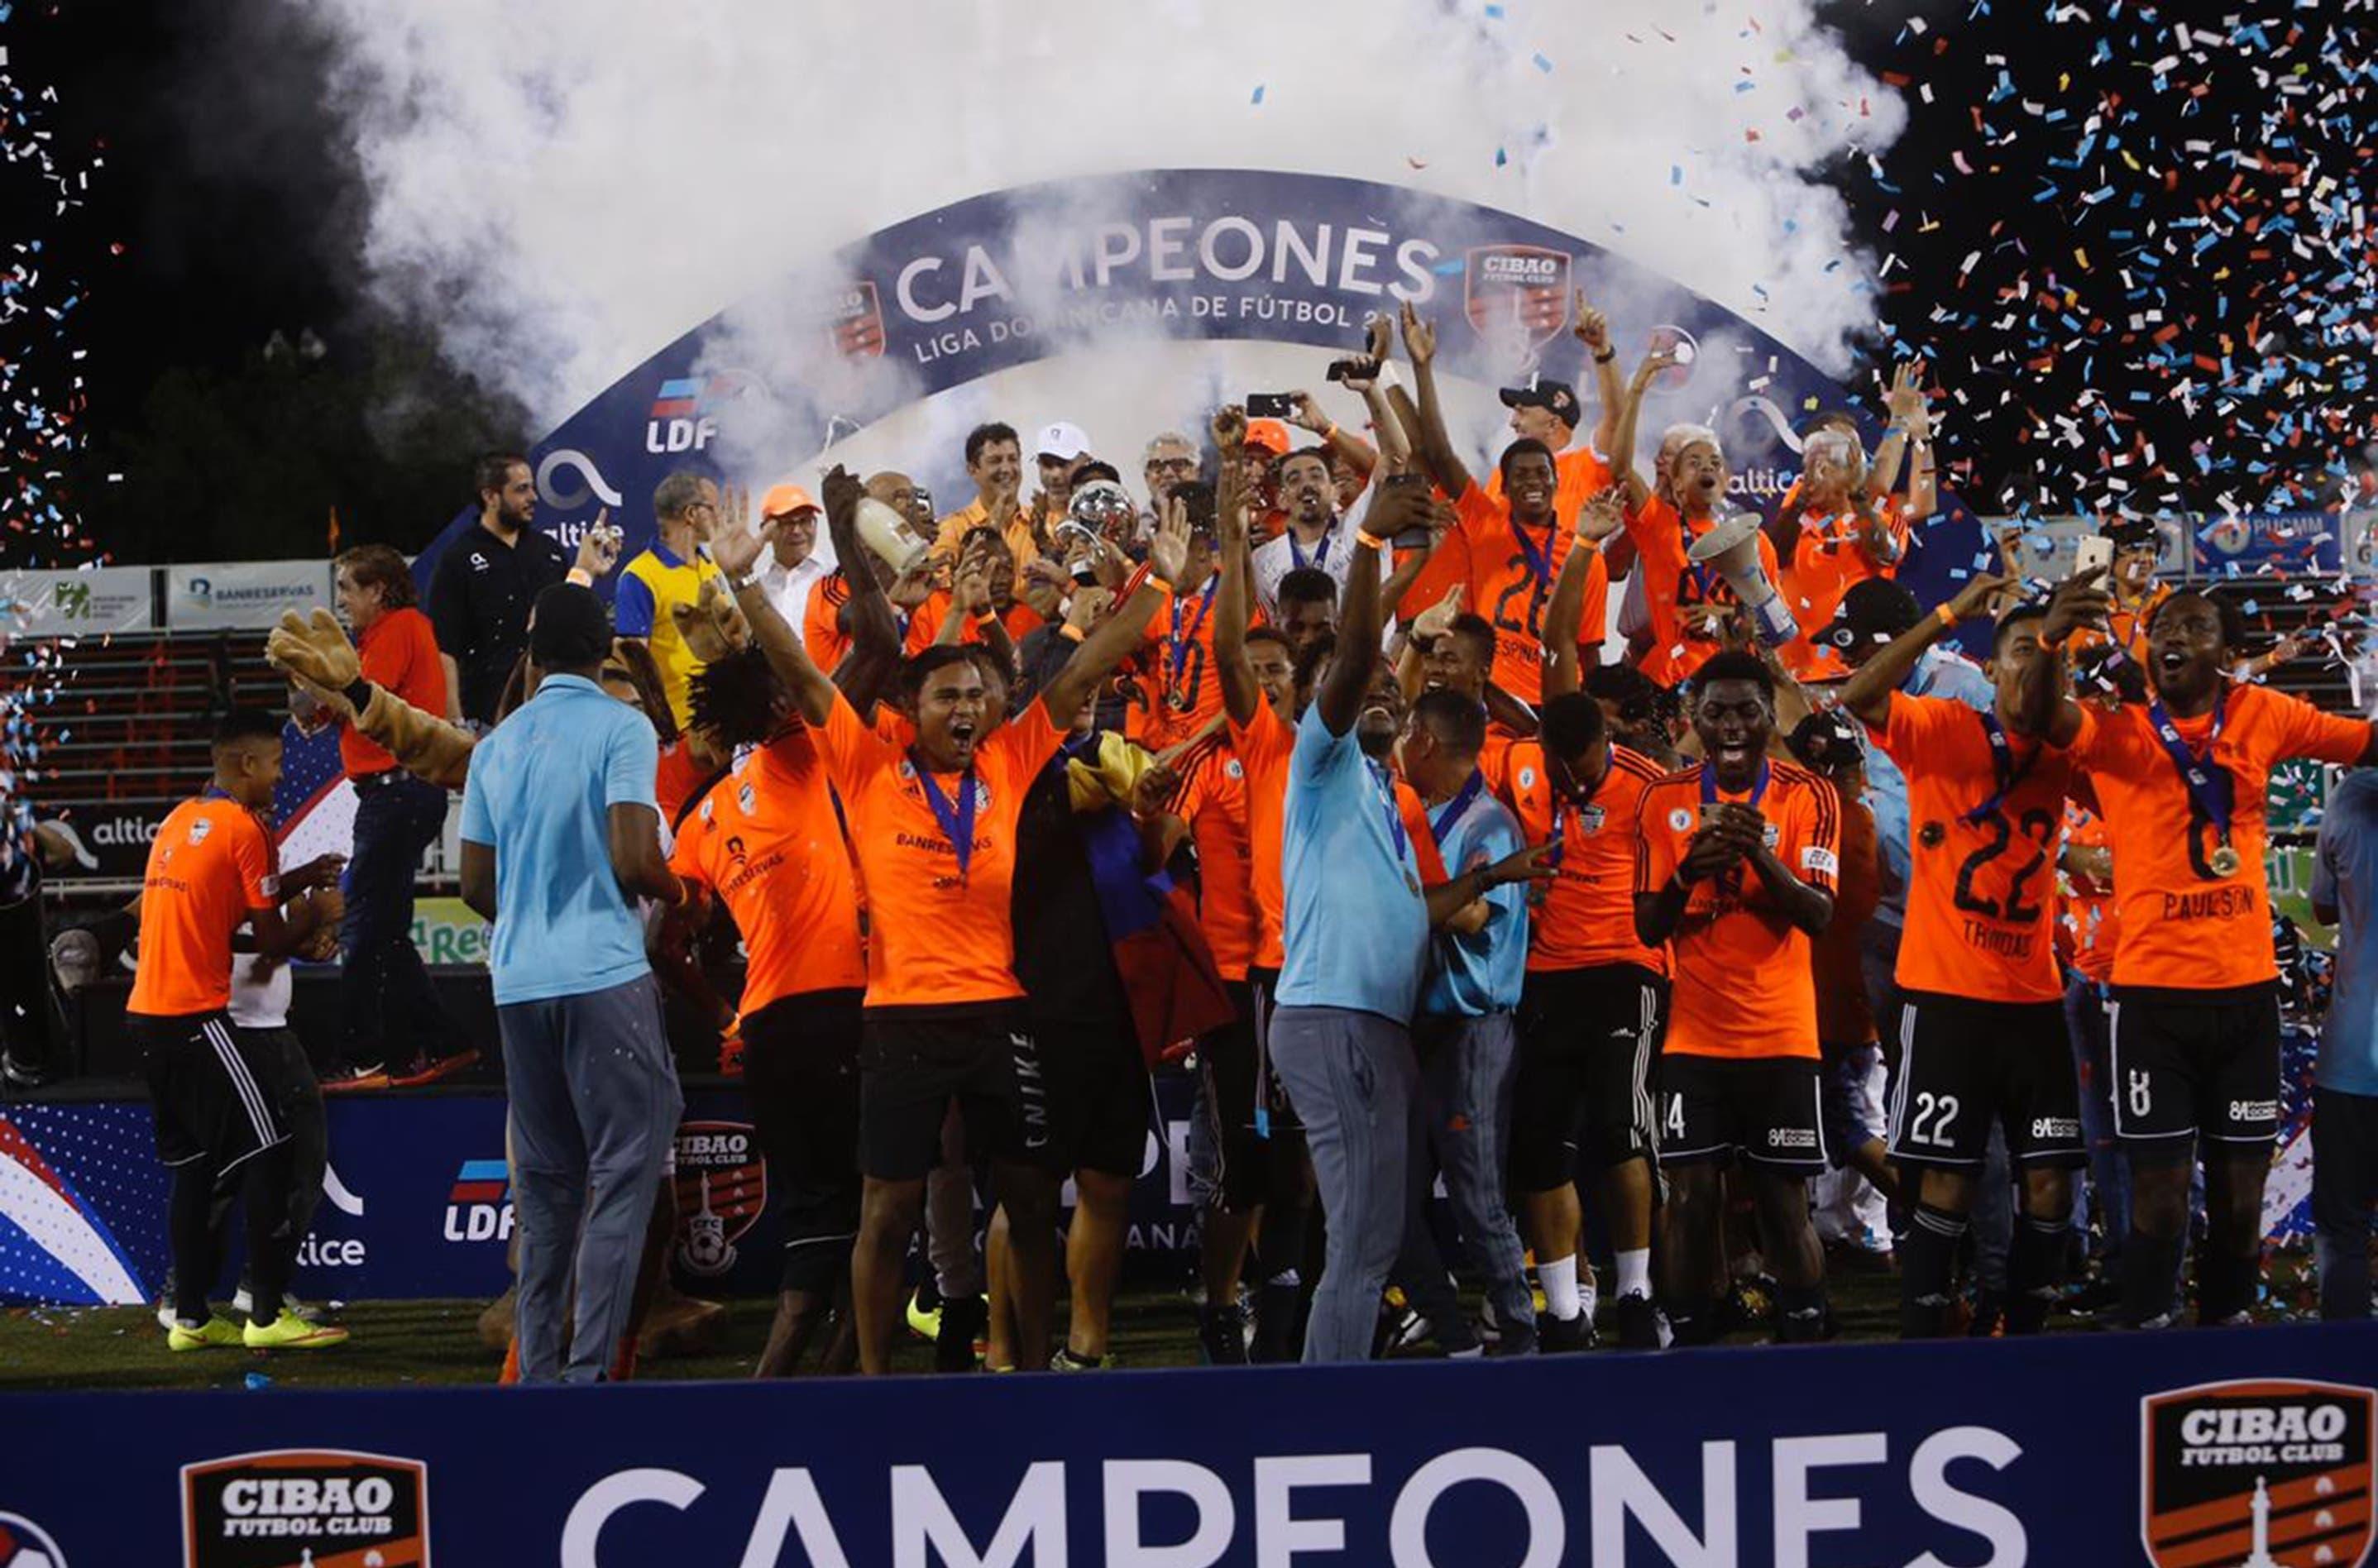 4B_Deportes_10_1A,p03